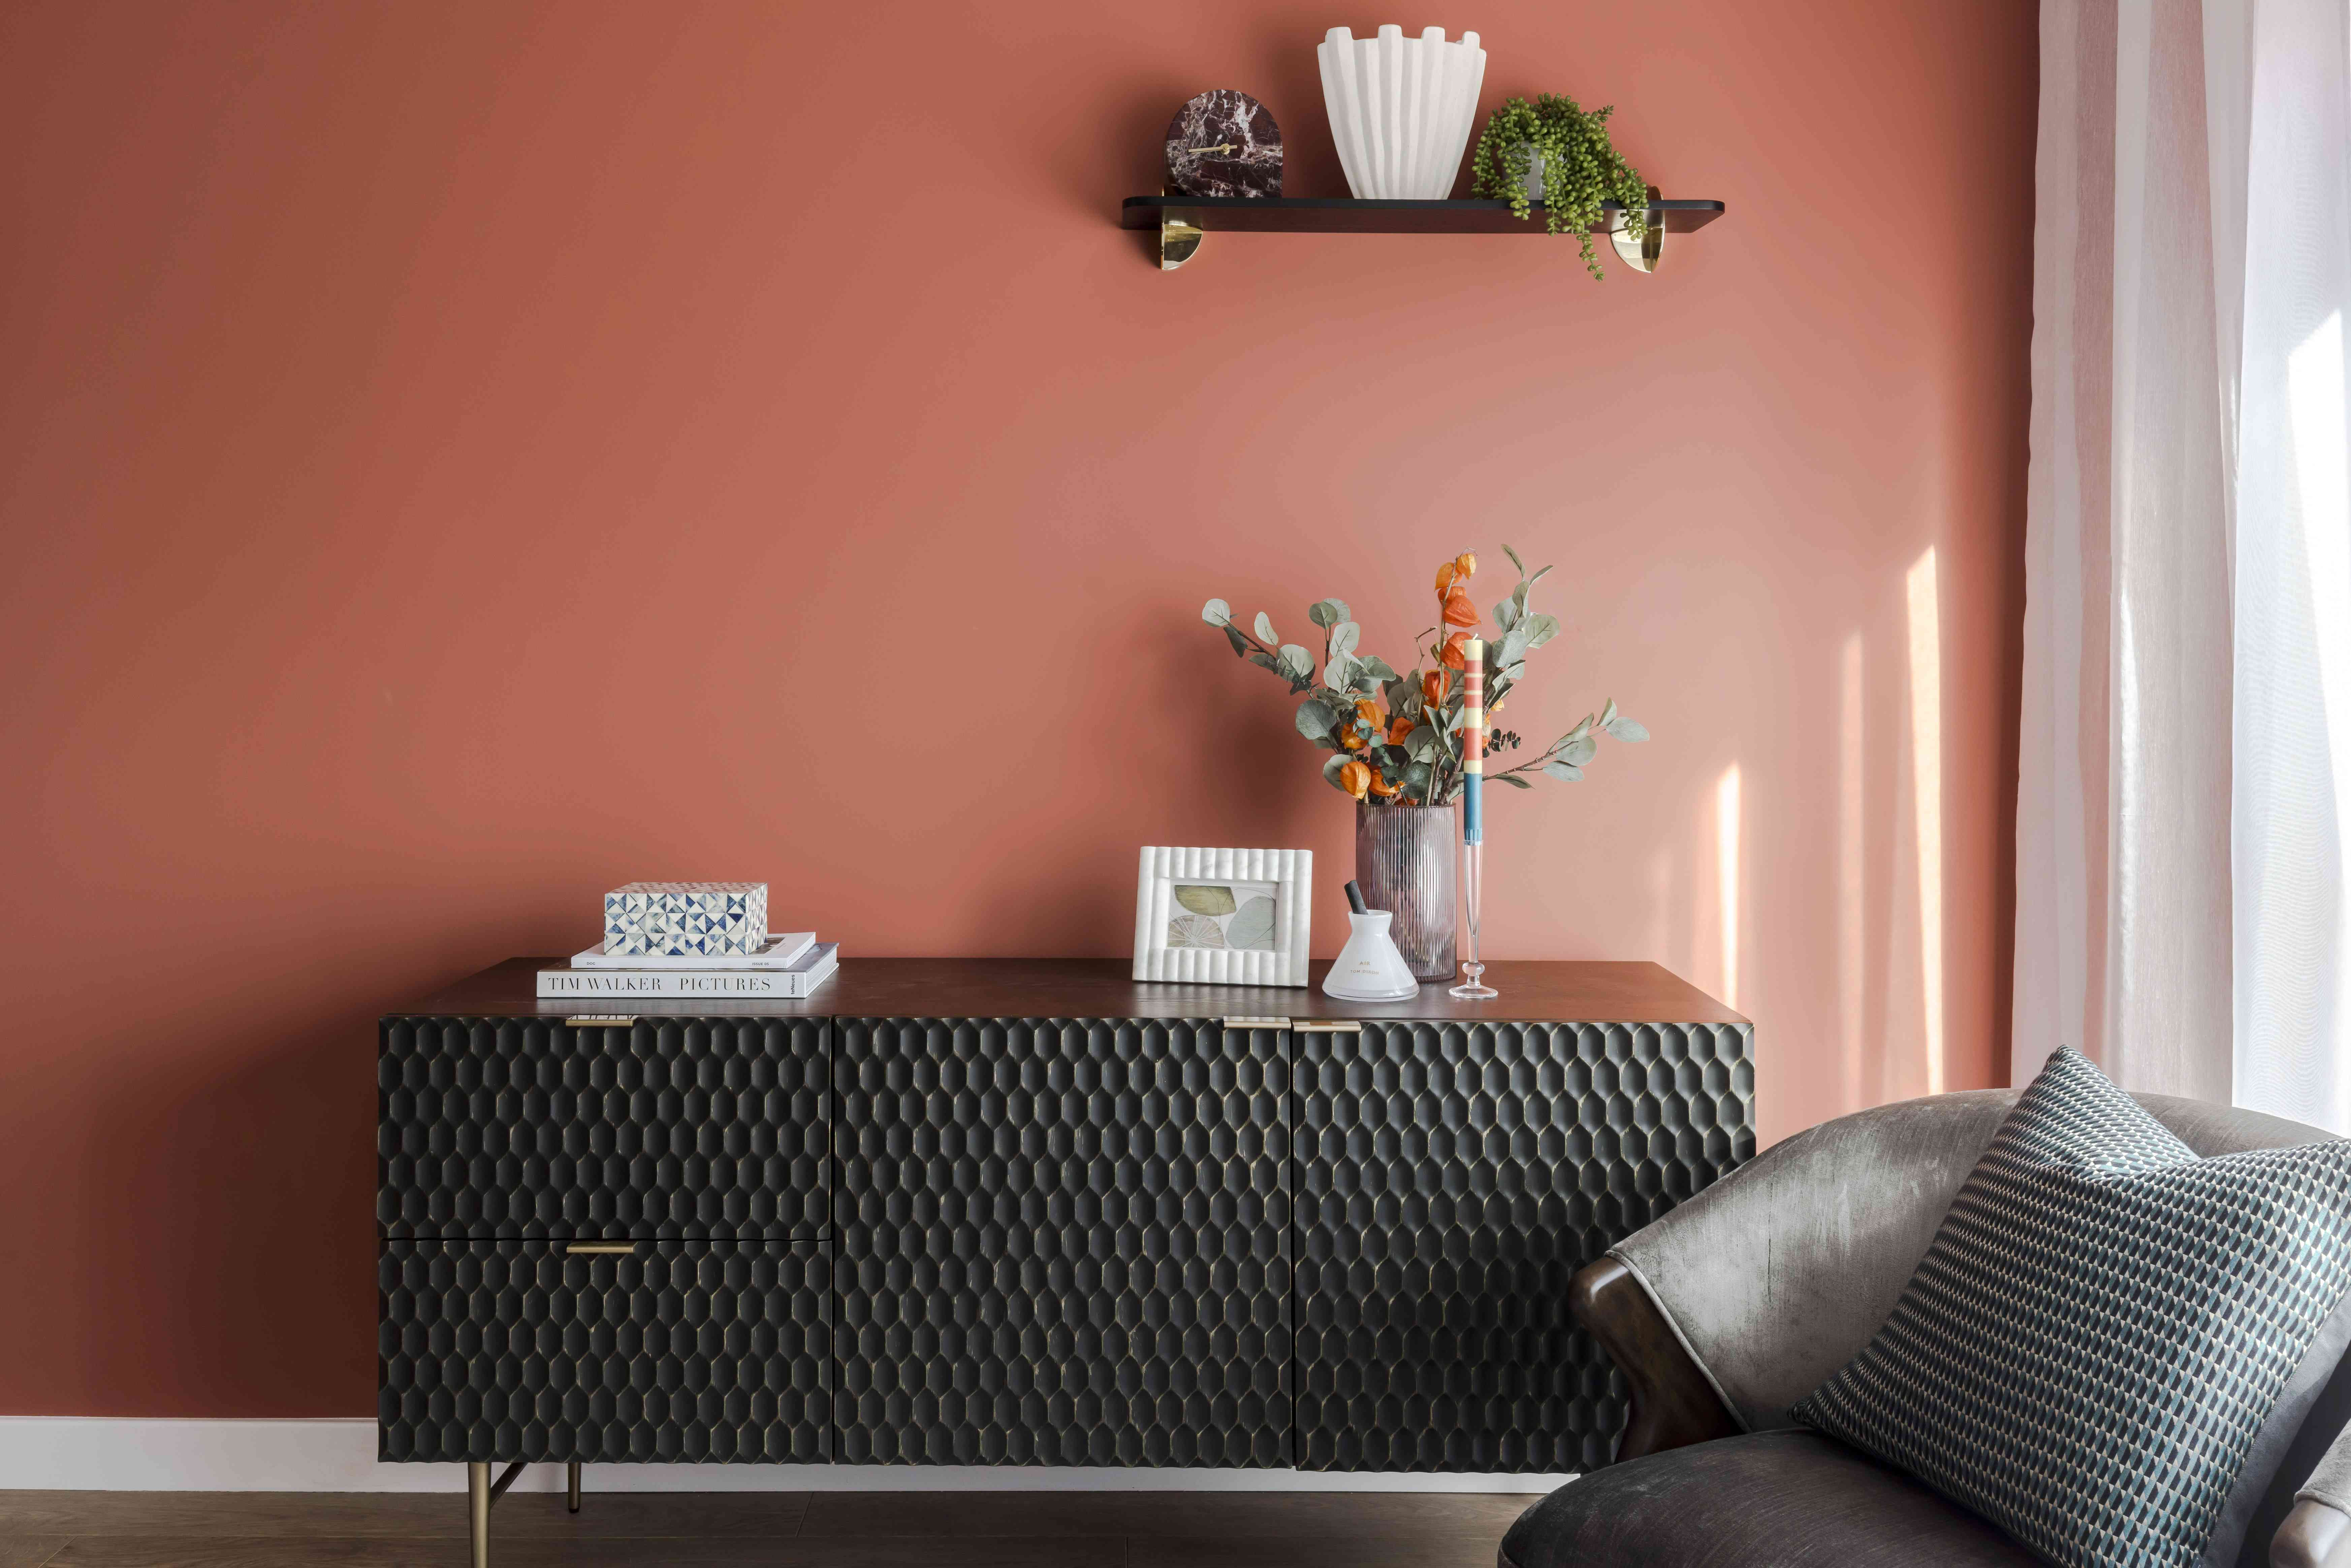 A styled single shelf follows the triangle rule